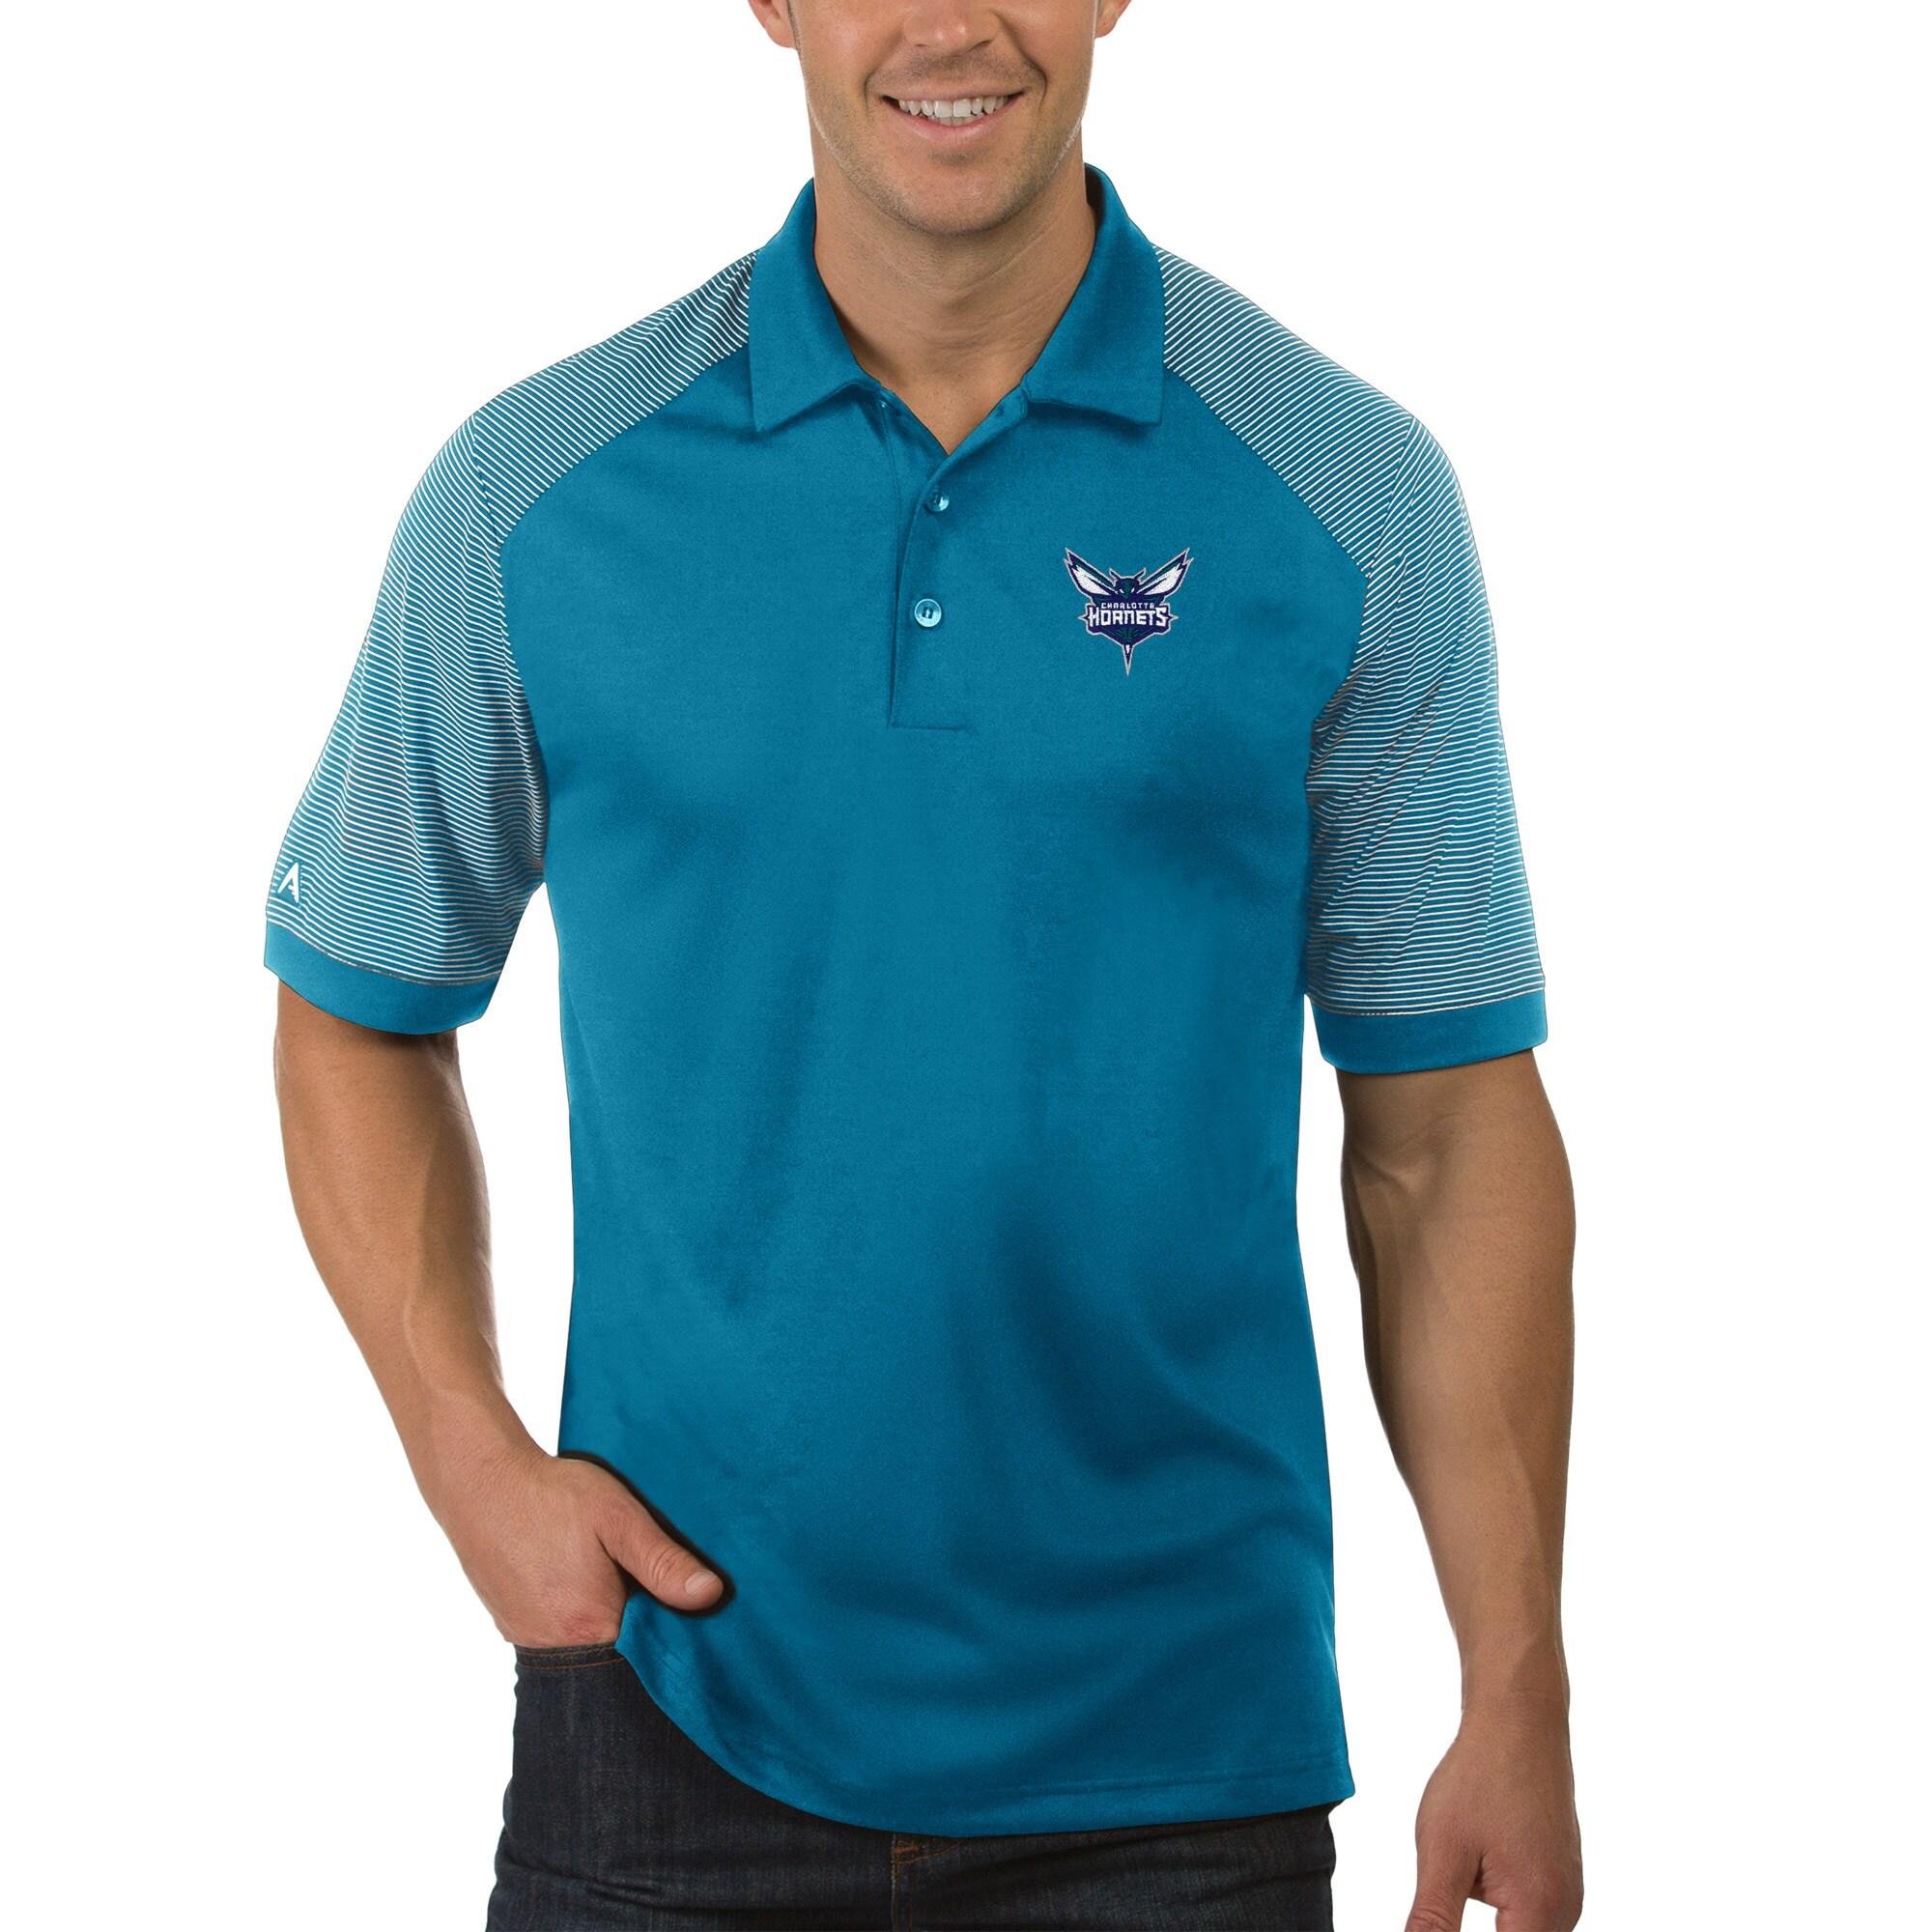 Charlotte Hornets Antigua Engage Polo - Teal